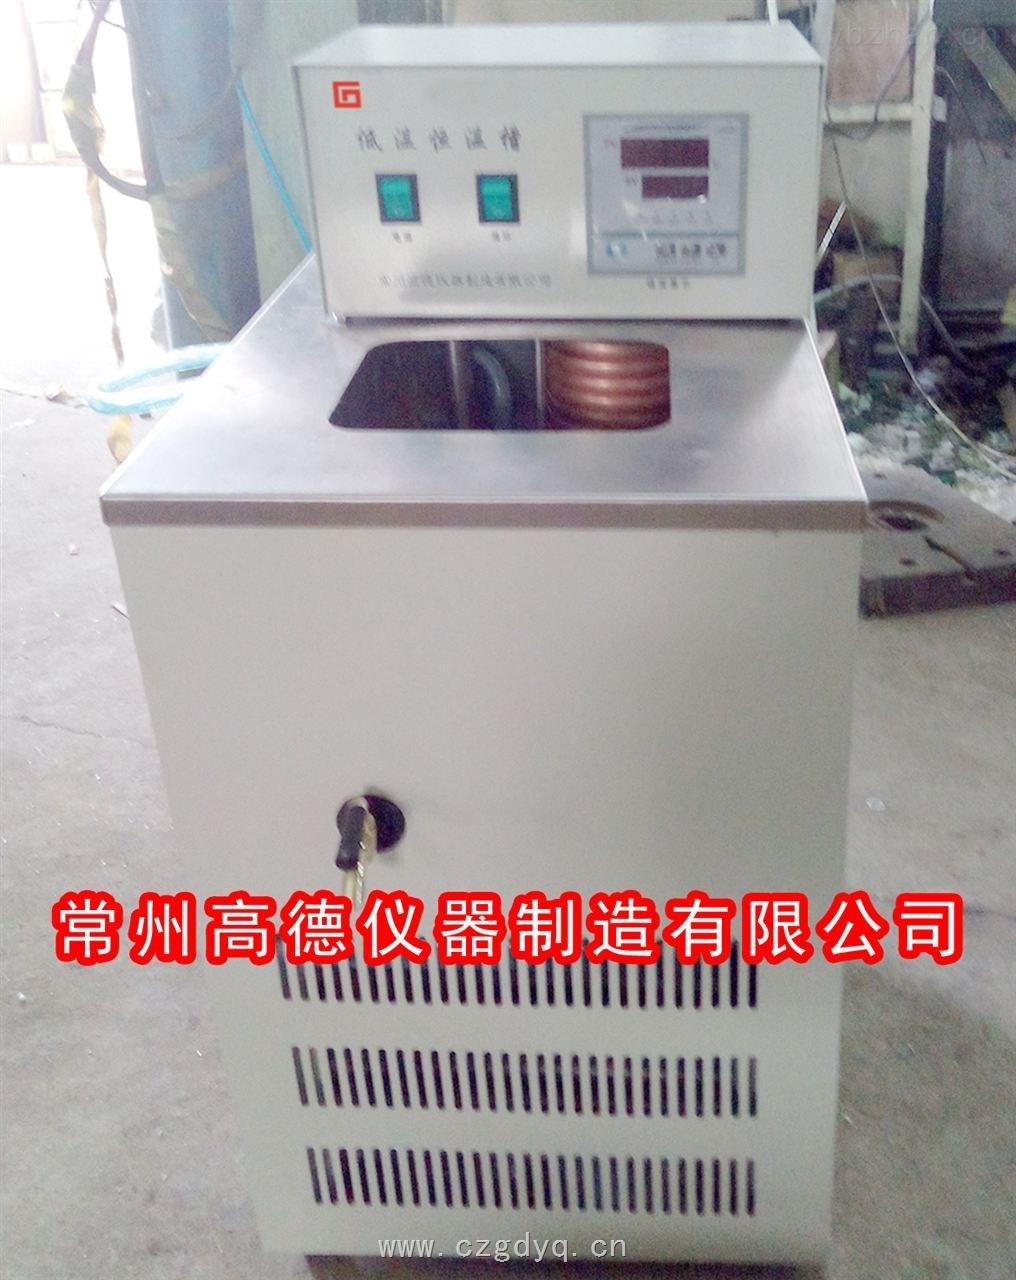 TC-501-高精度低溫恒溫槽